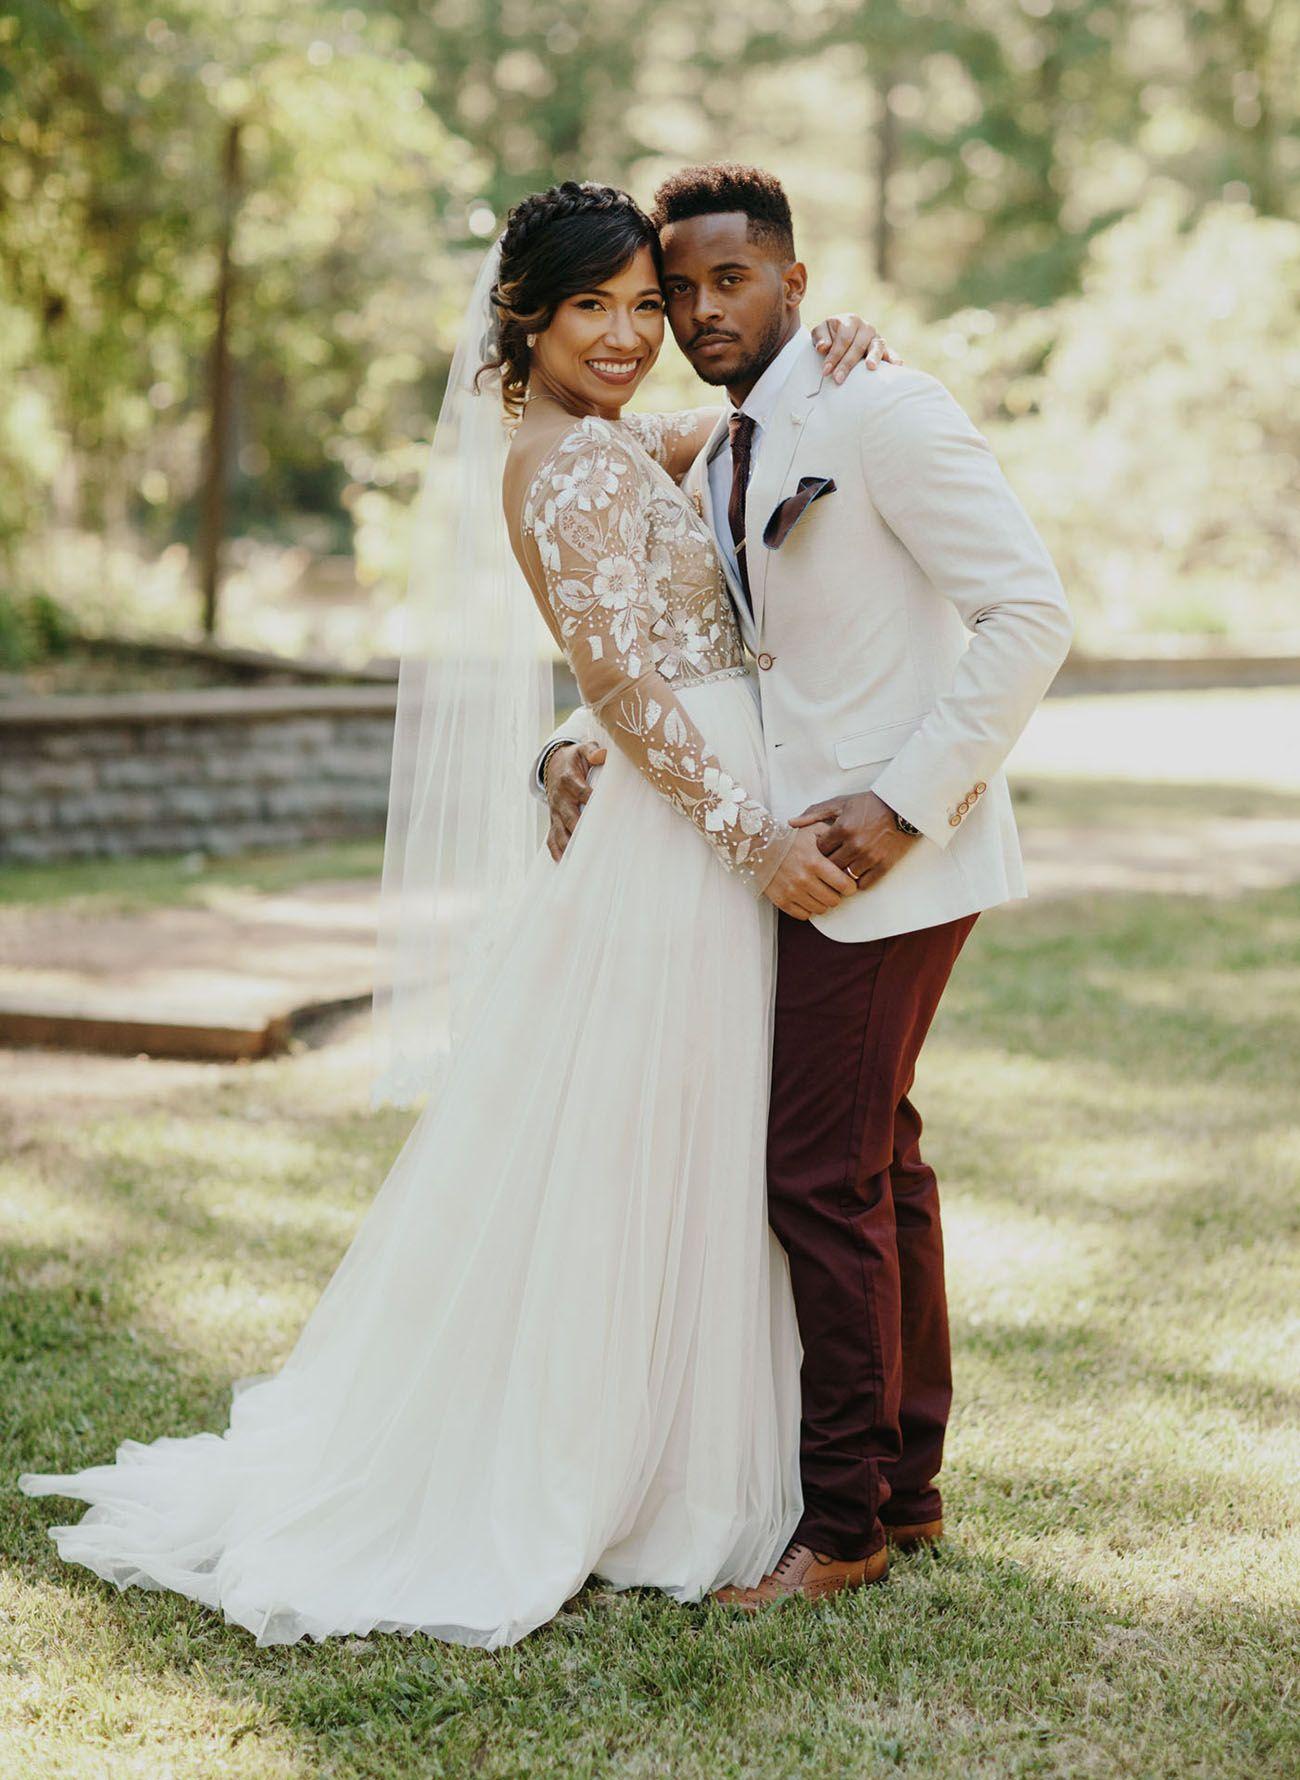 Burgundy + Cream Rustic Chic Texas Wedding Wedding suits